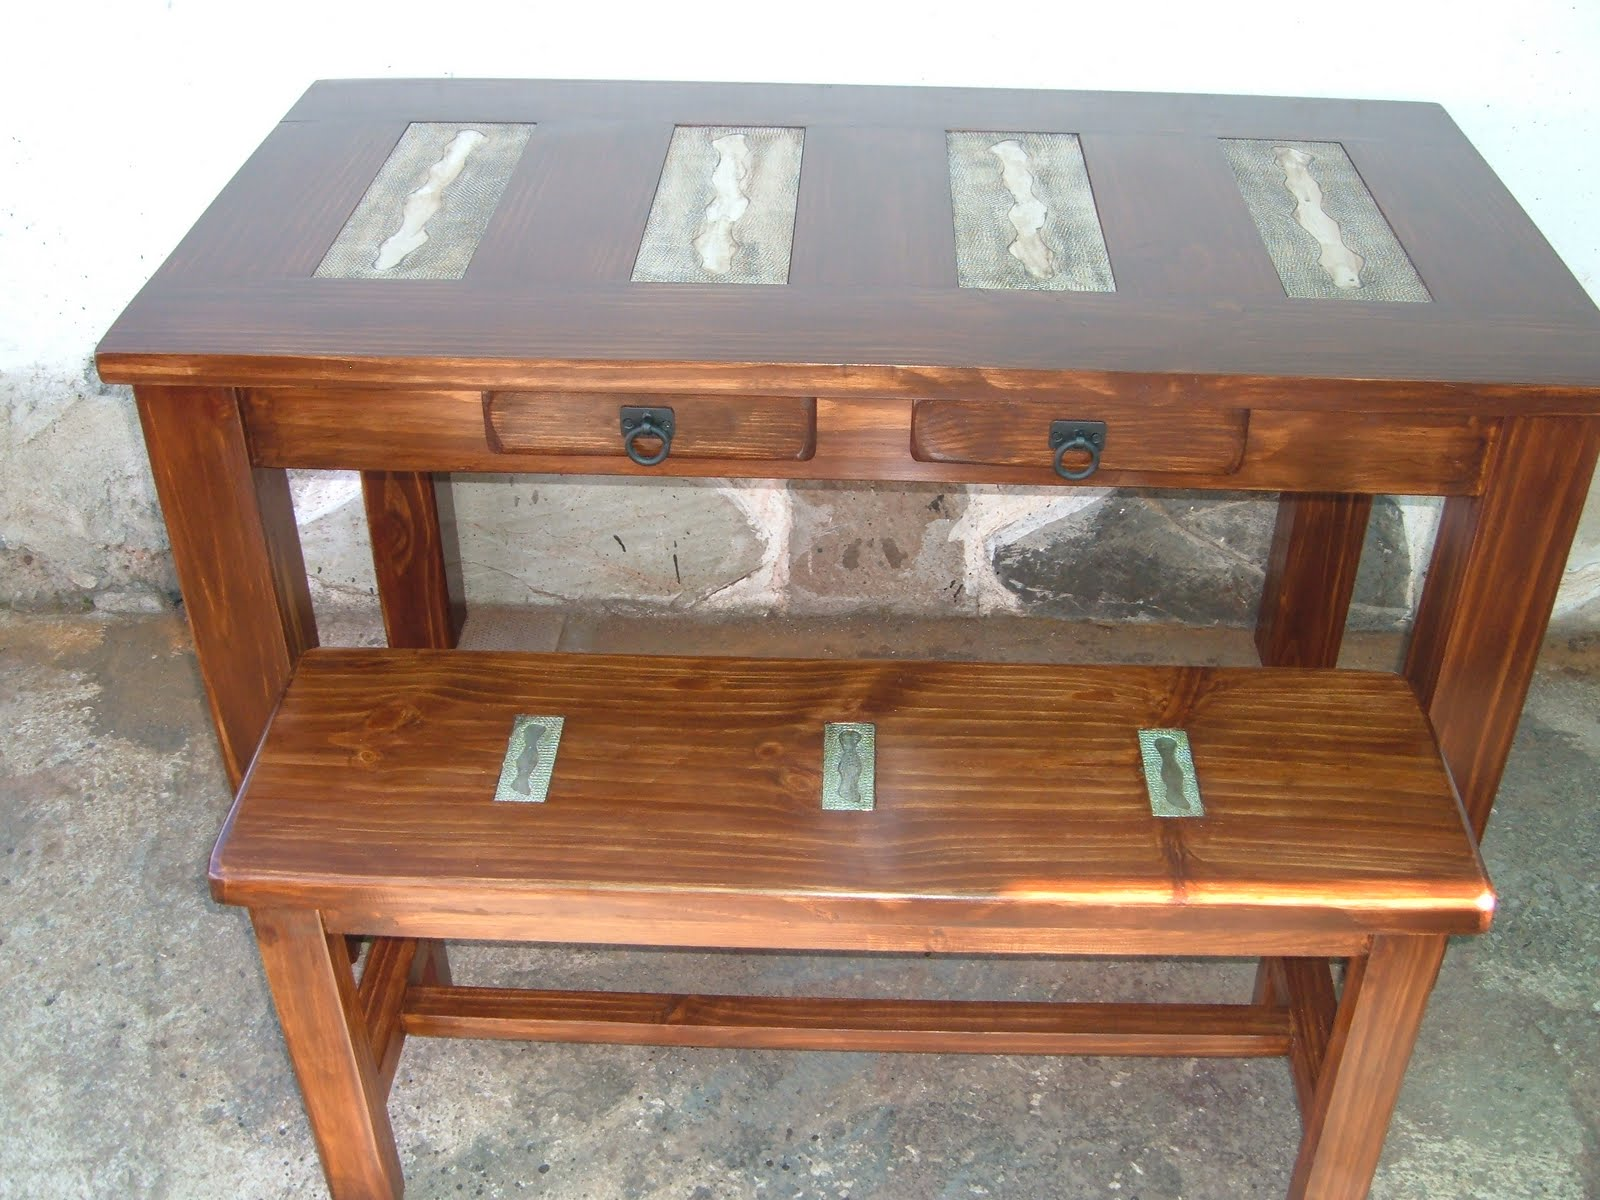 Herreria el vasco muebles en hierro for Muebles vascos